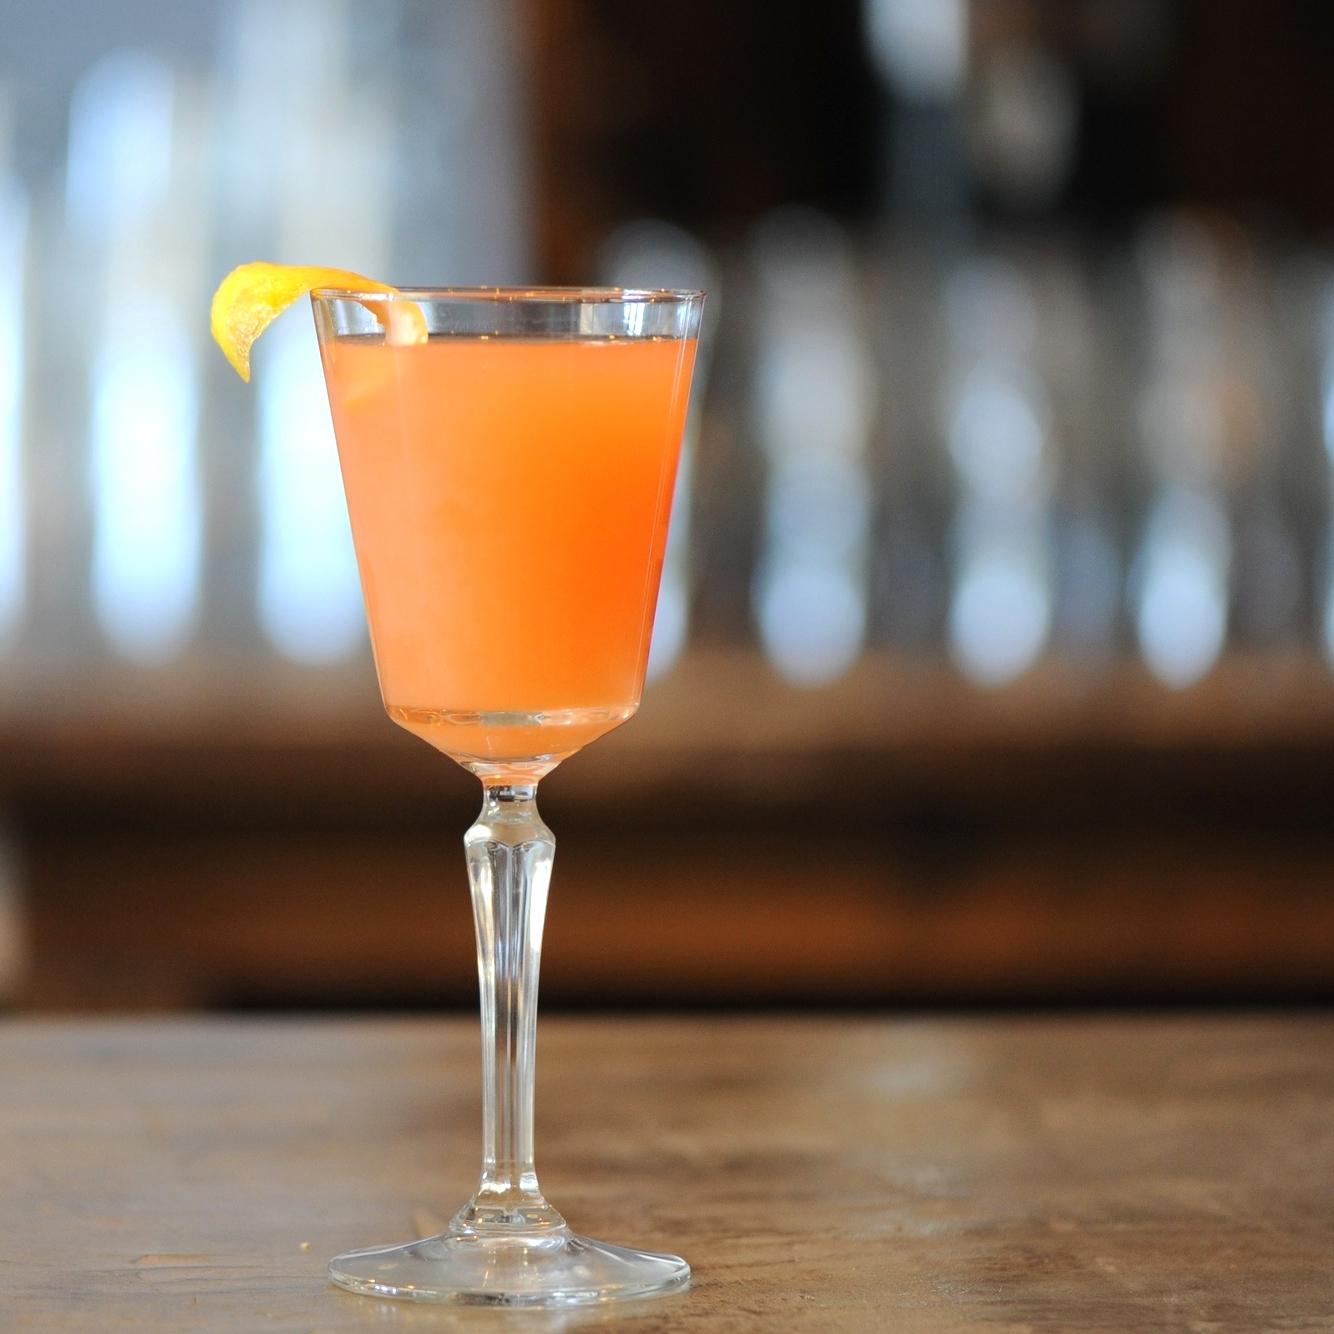 the-cocktail-experiment-syrups-grenadine-monkey-gland.jpg